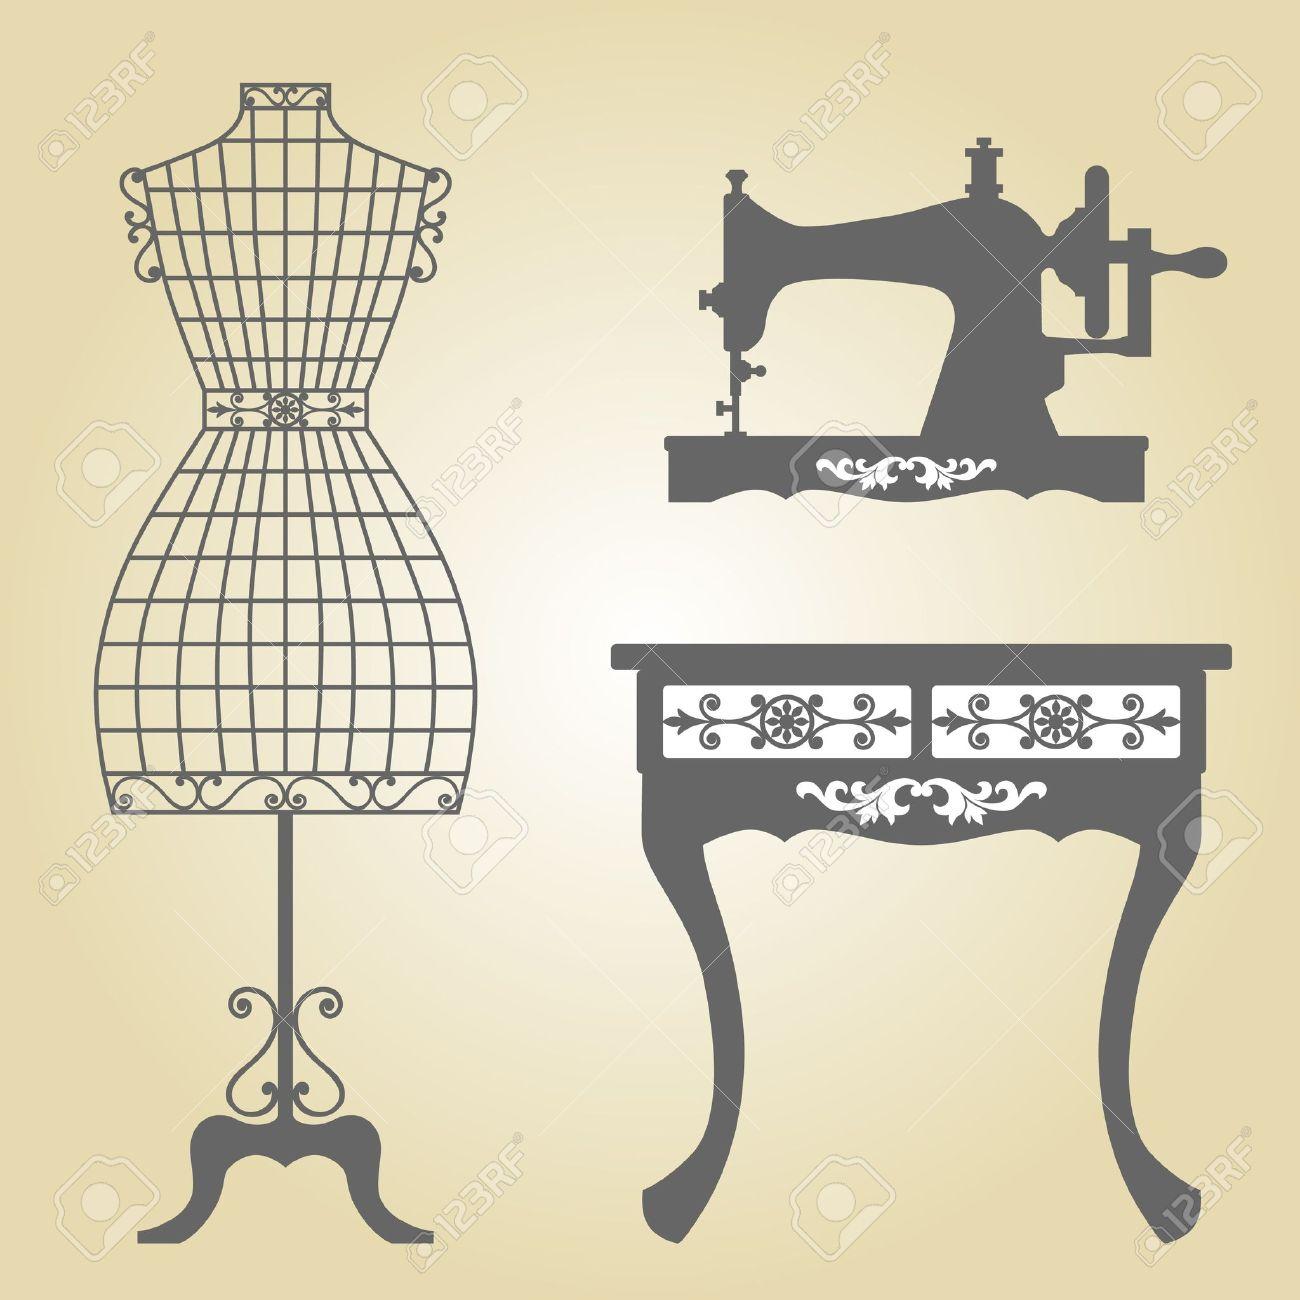 Vintage Mannequin and Sewing Machine Vintage Wooden Mannequin Vintage Wrought Iron Mannequin in Floral Frame Vintage Sewing Machine Sillhouette - 21644934